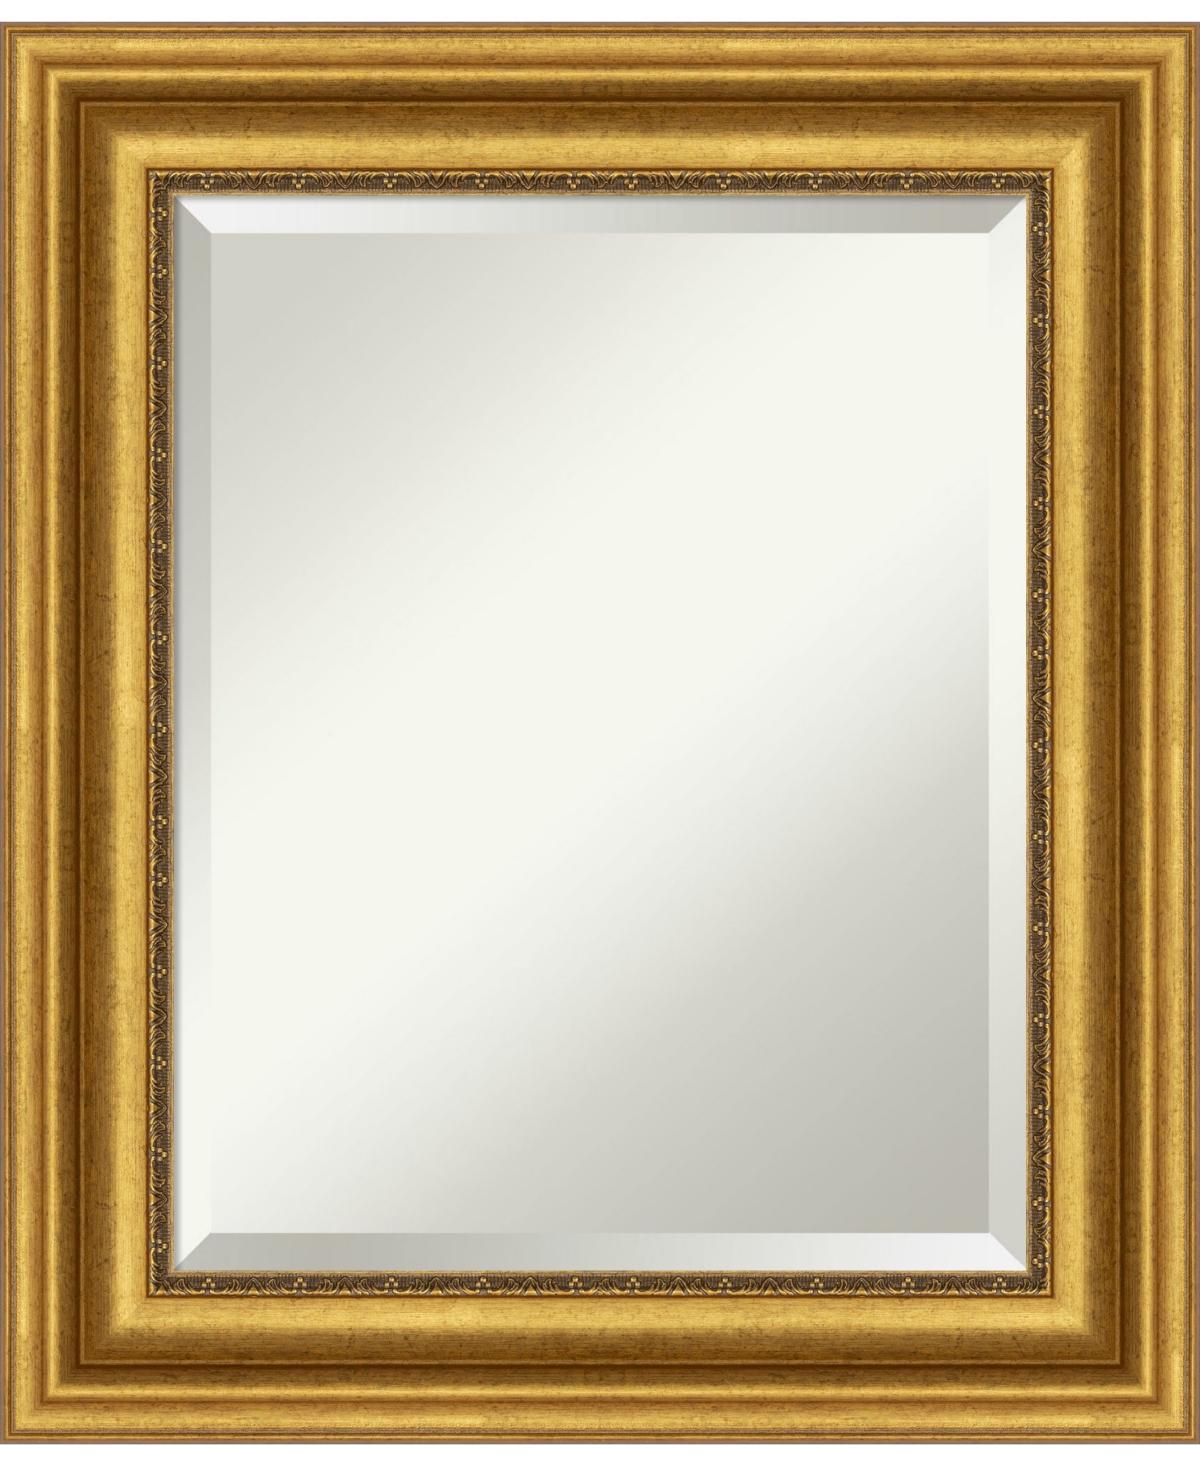 Amanti Art Parlor Gold-tone Framed Bathroom Vanity Wall Mirror, 21.62